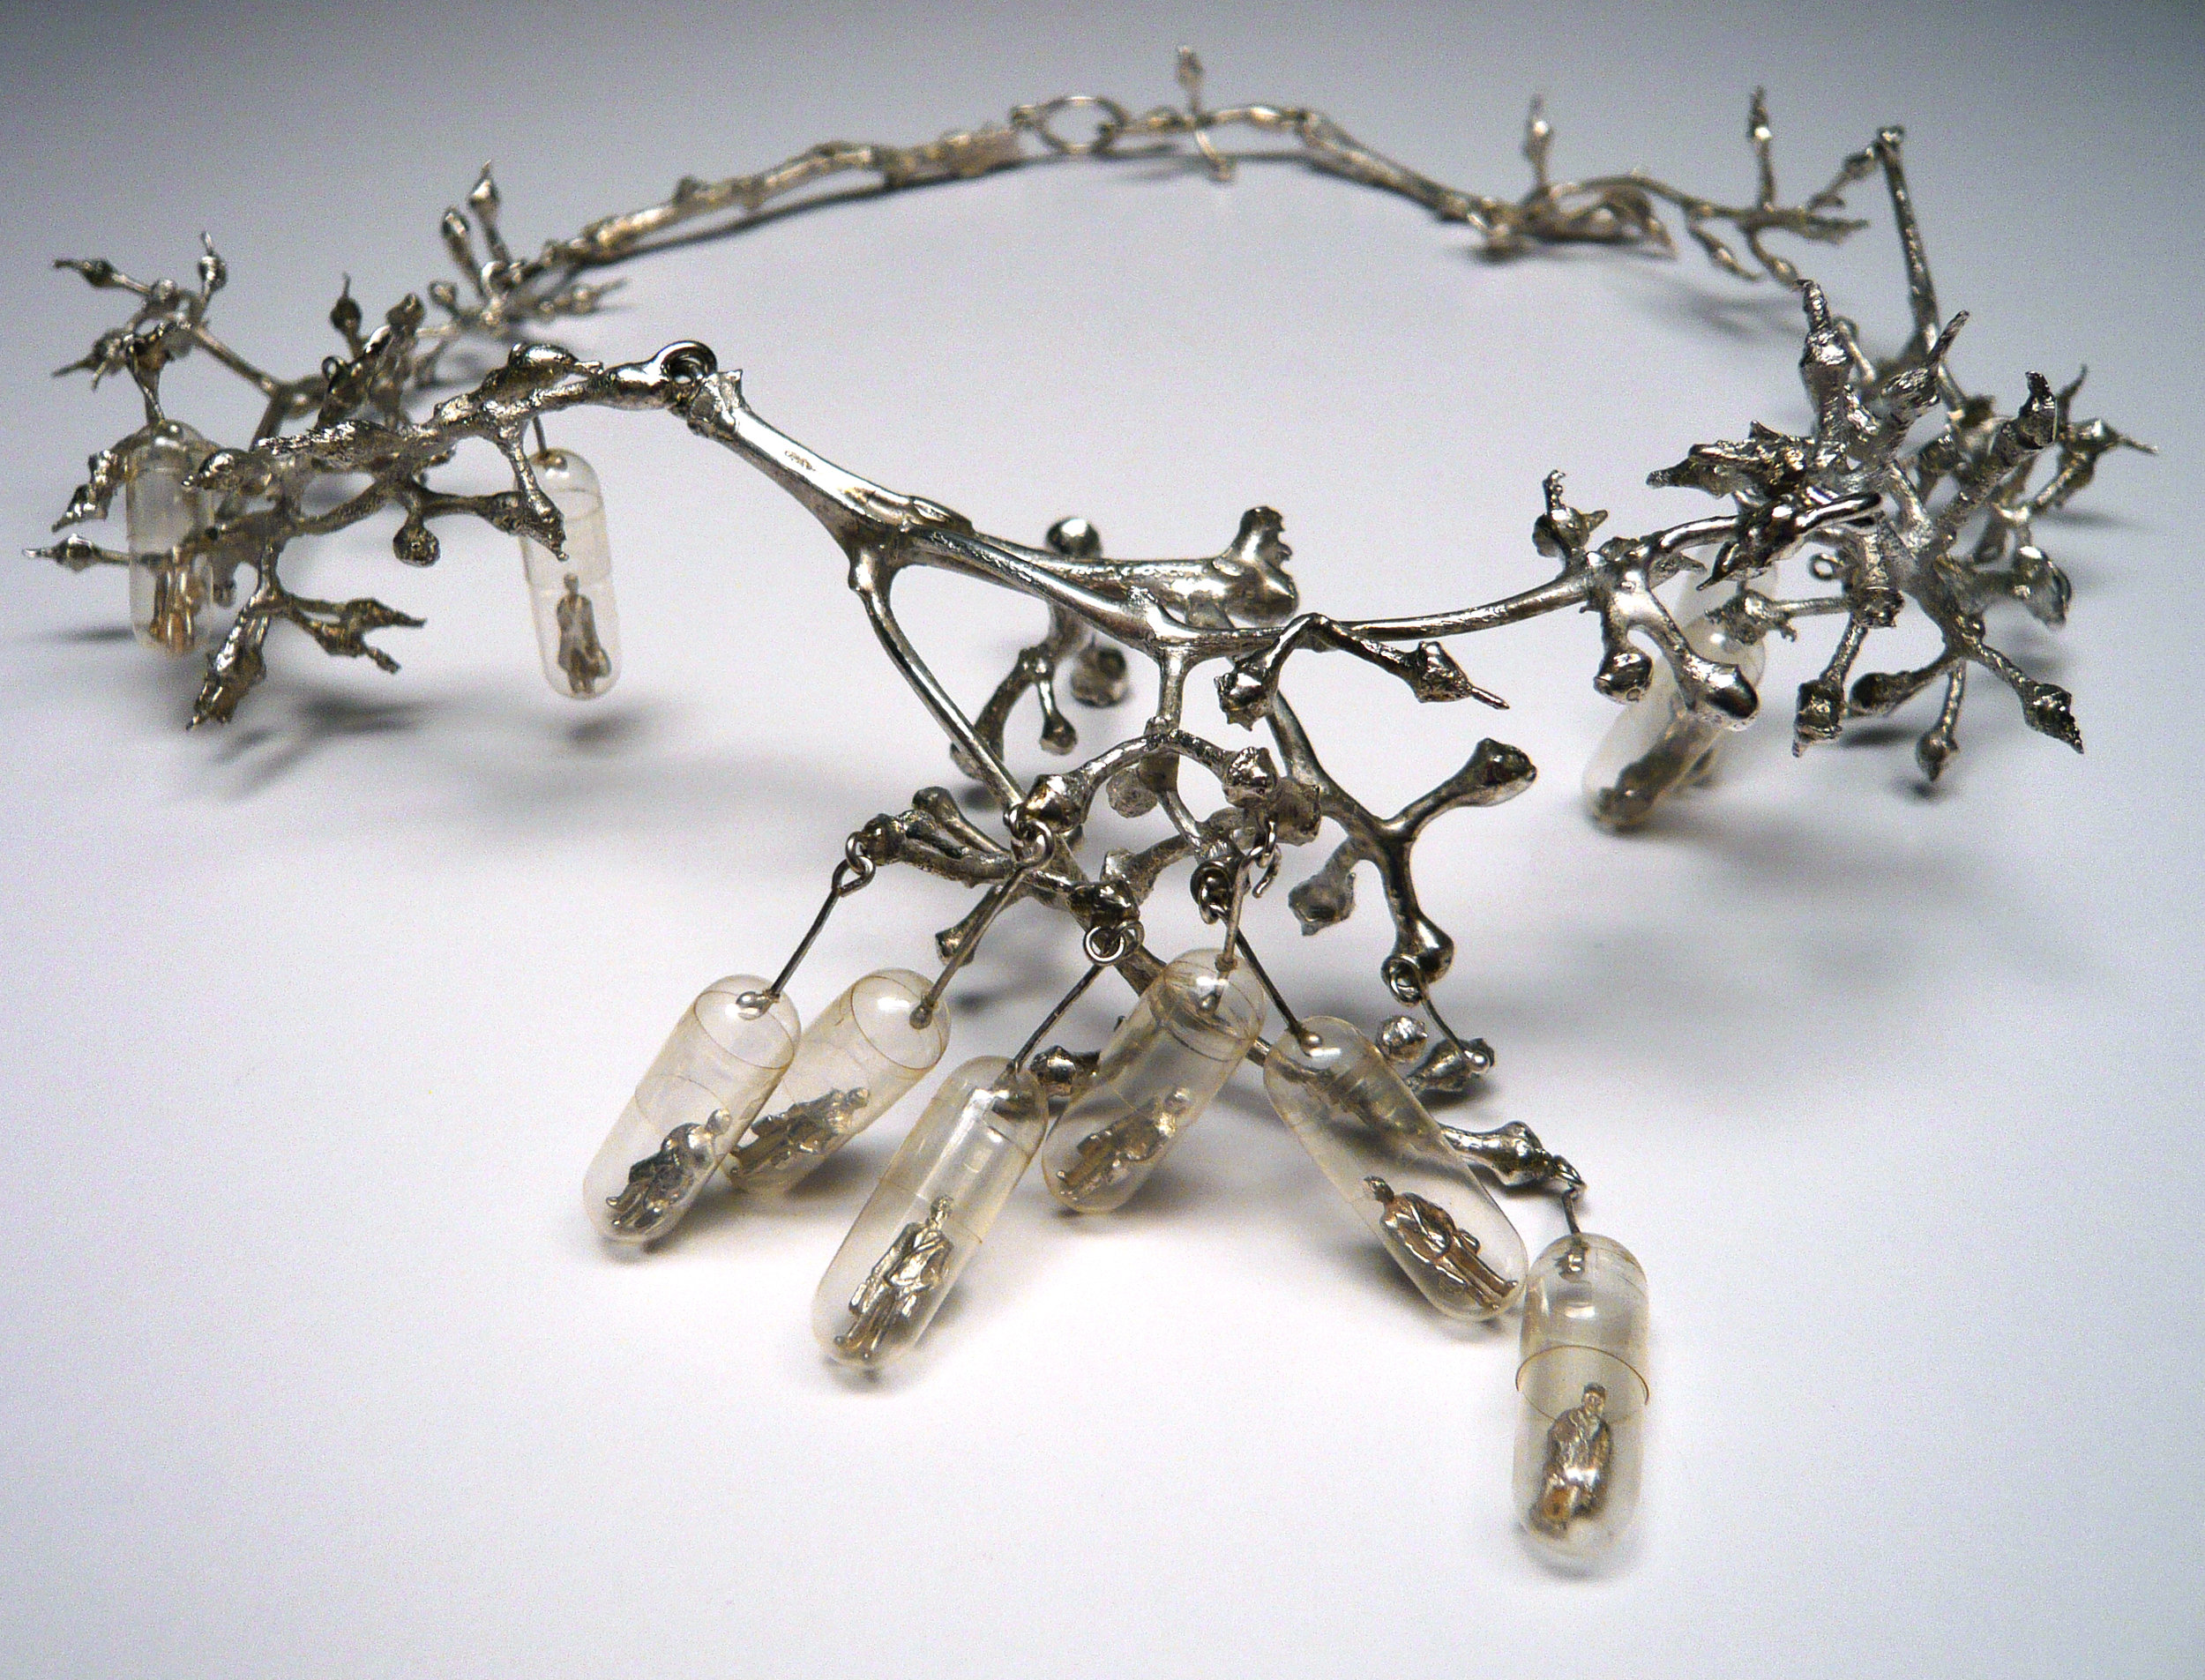 007_Harvest_necklace_Bove.jpg